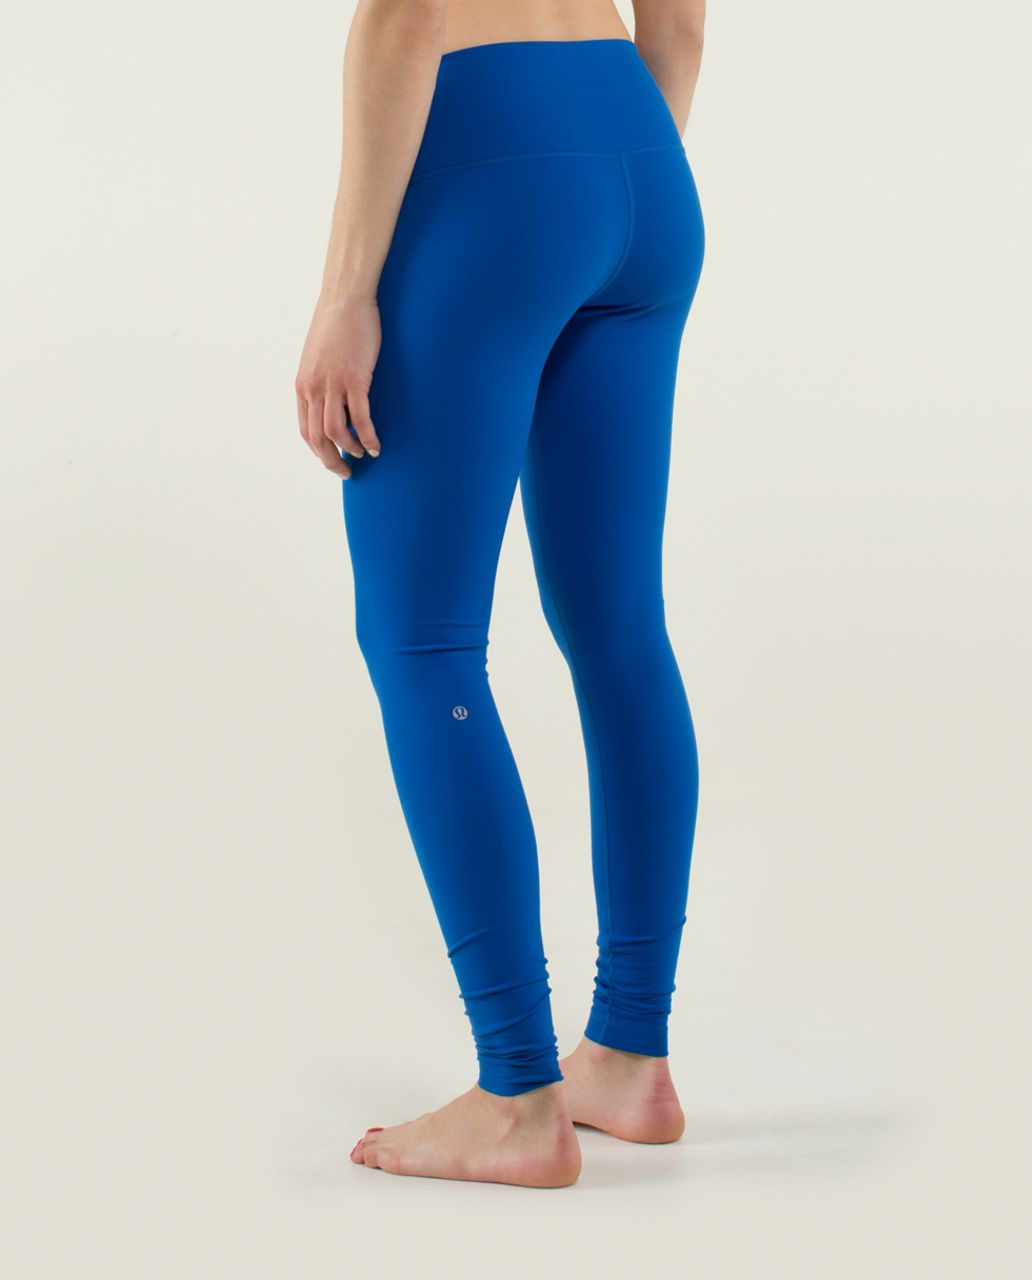 Lululemon Wunder Under Pant (High/Low) *Full-On Luon - Baroque Blue